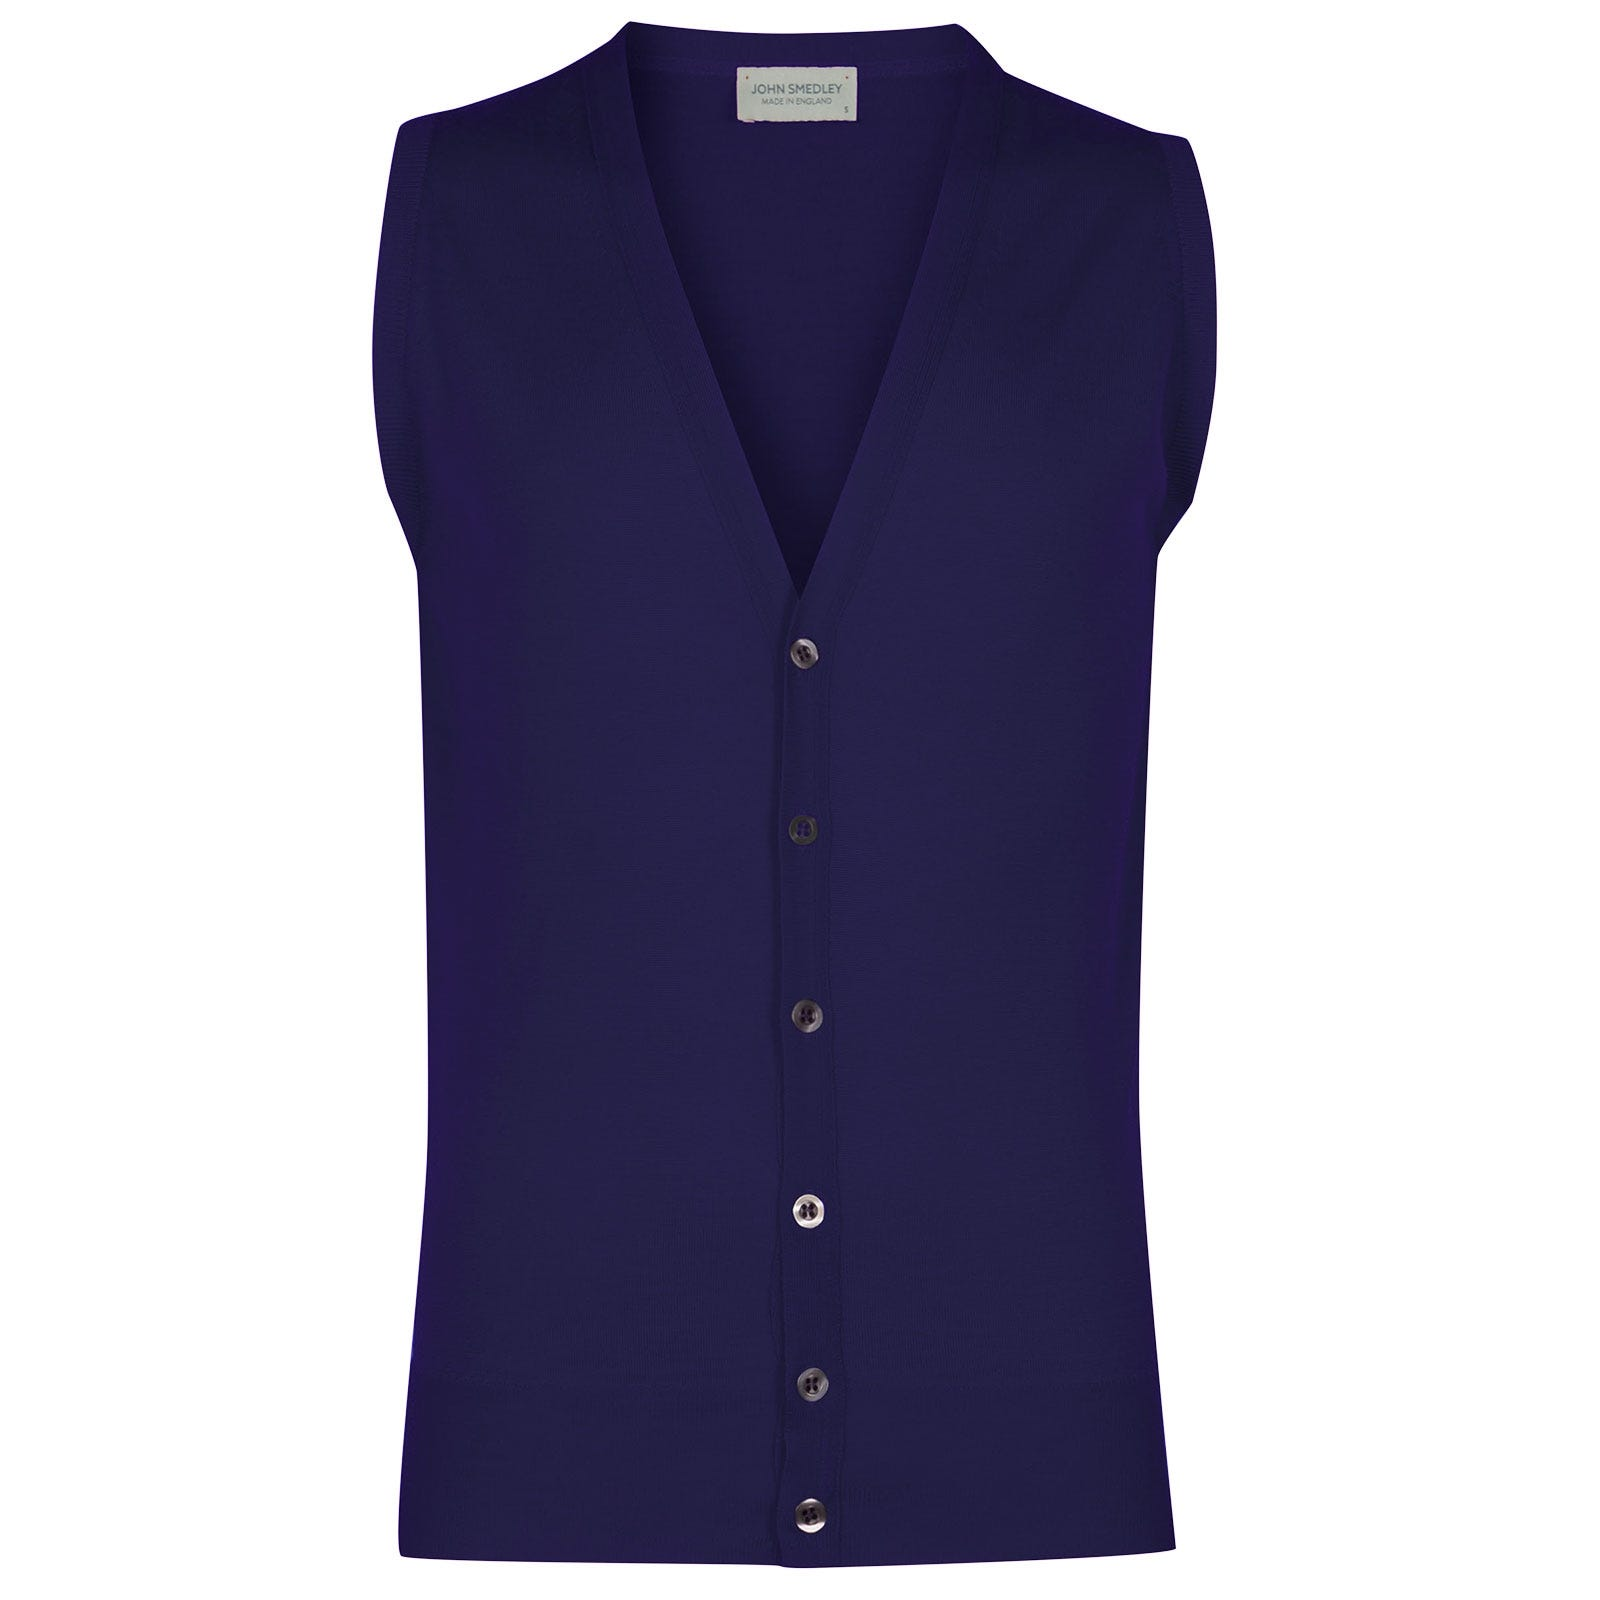 John Smedley Huntswood Merino Wool Waistcoat in Serge Blue-XXL